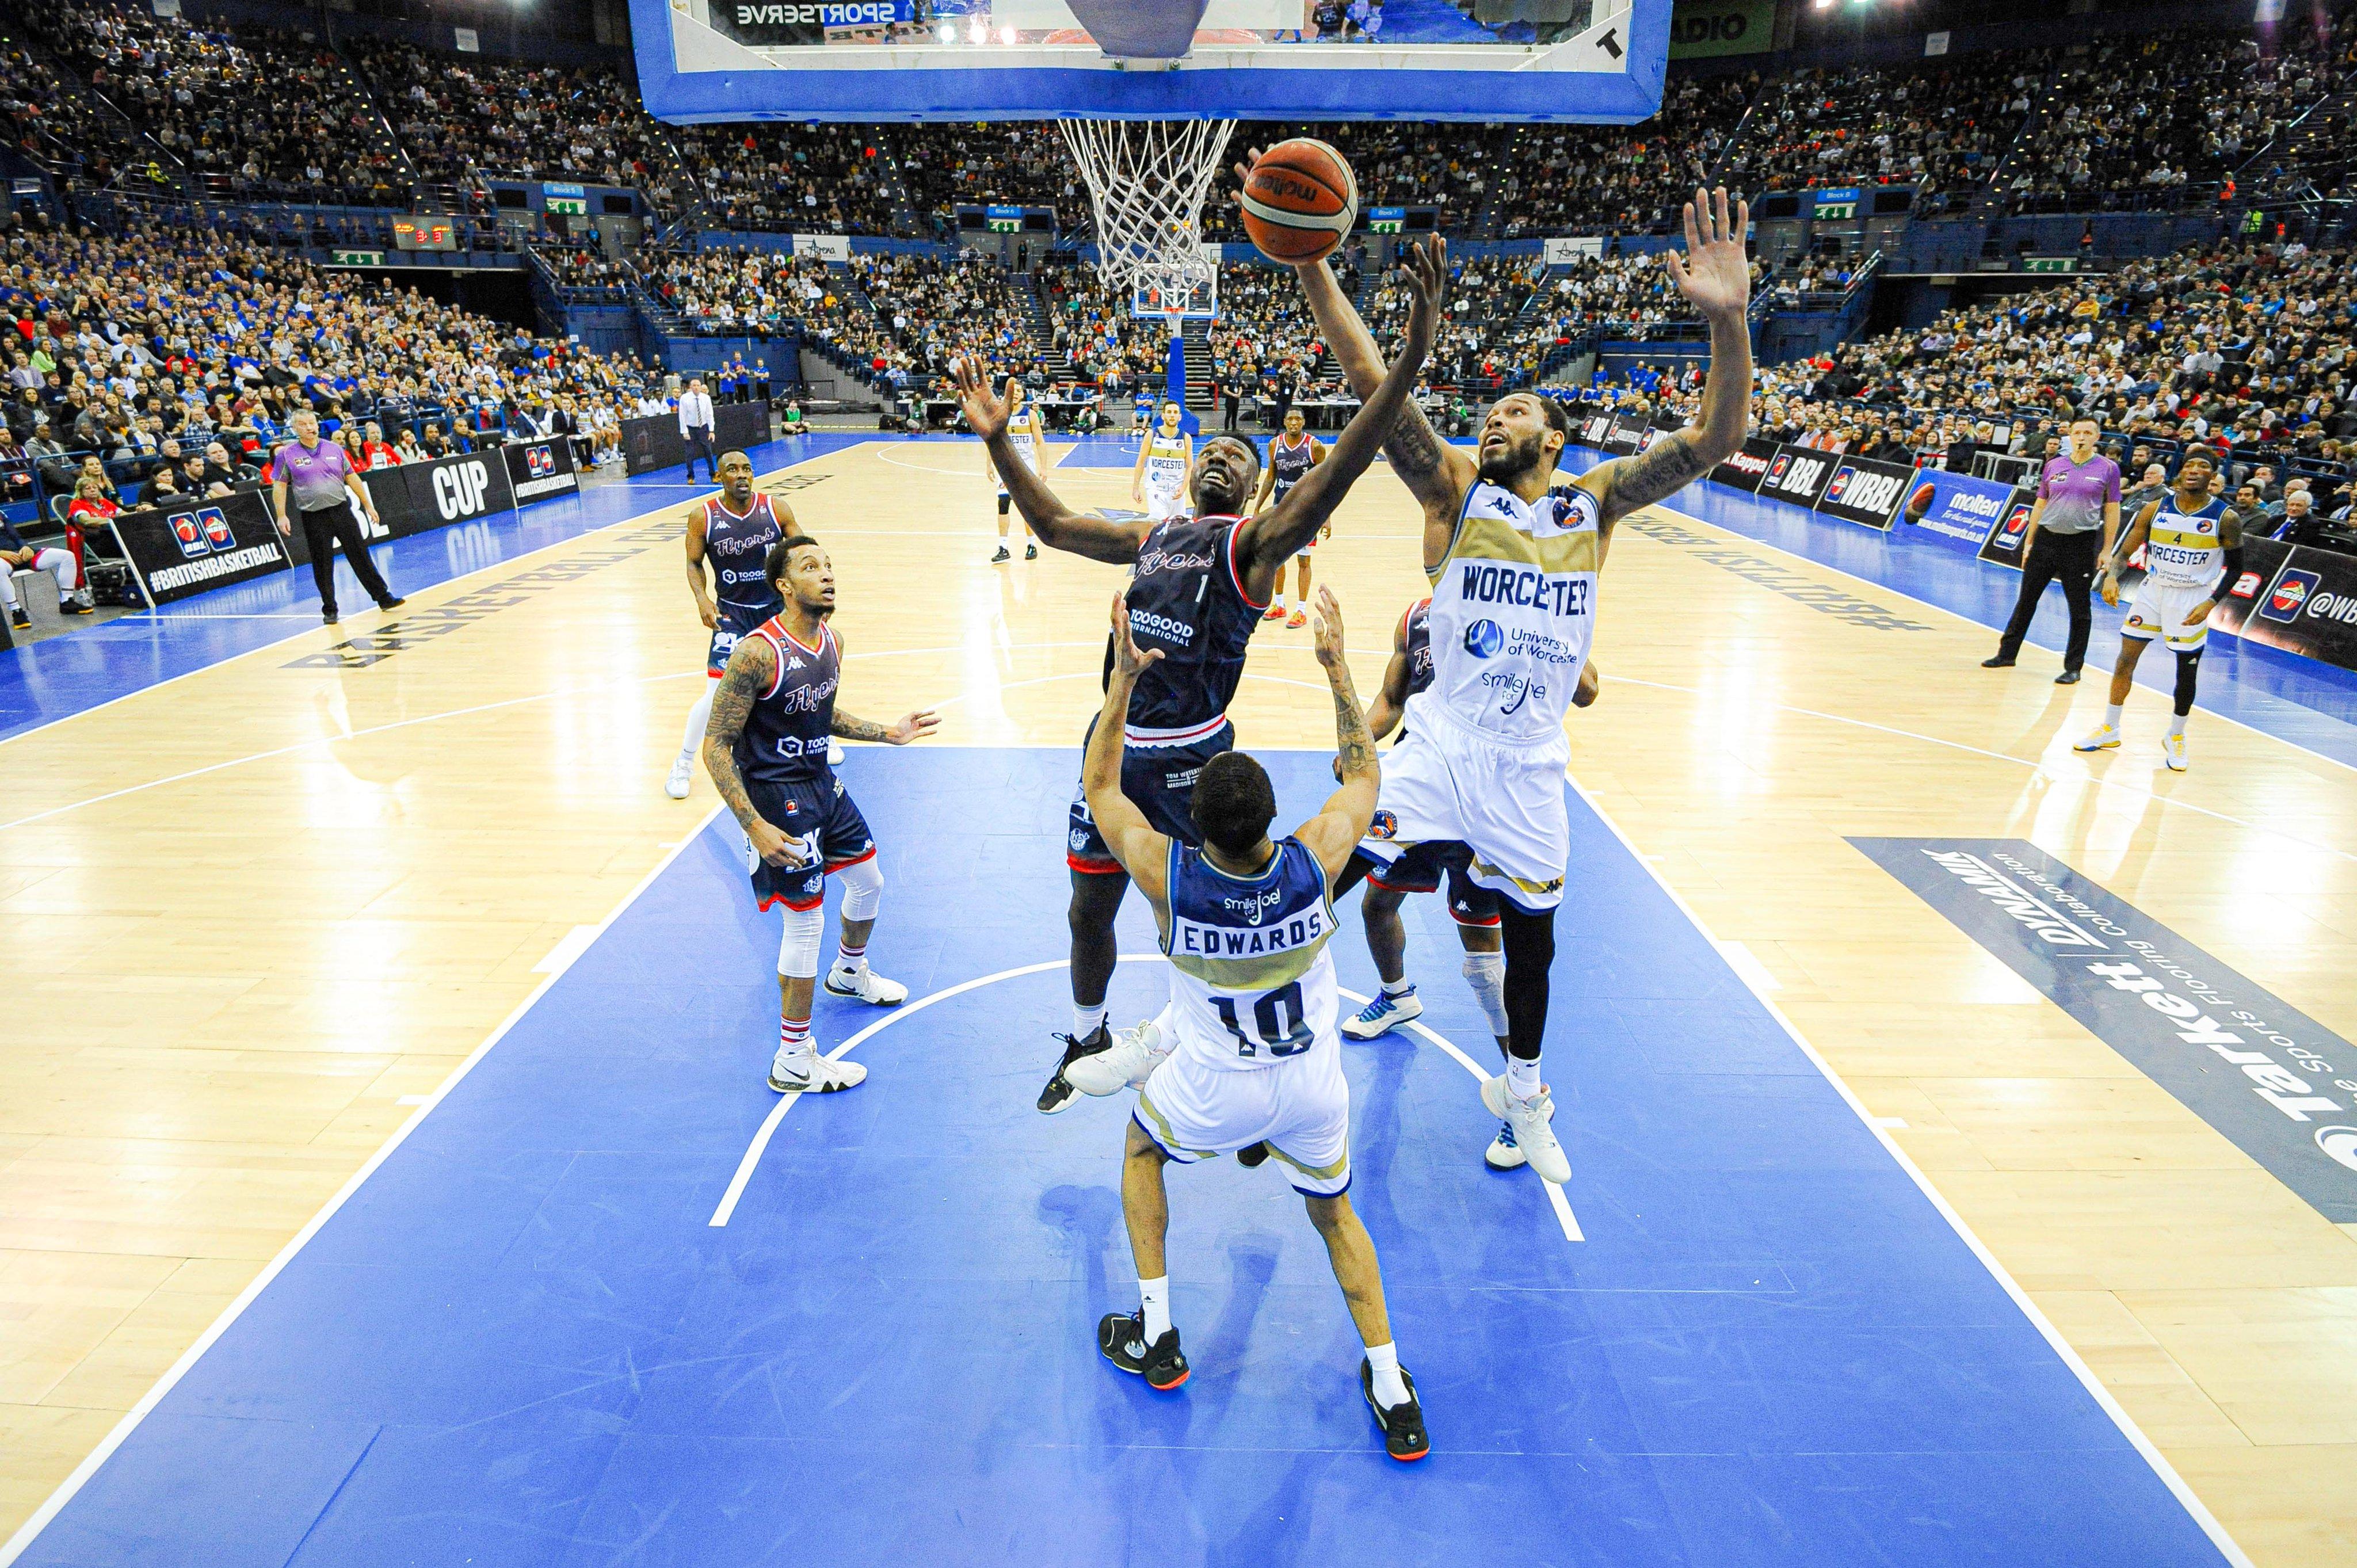 British Basketball League (BBL) Cup Finals